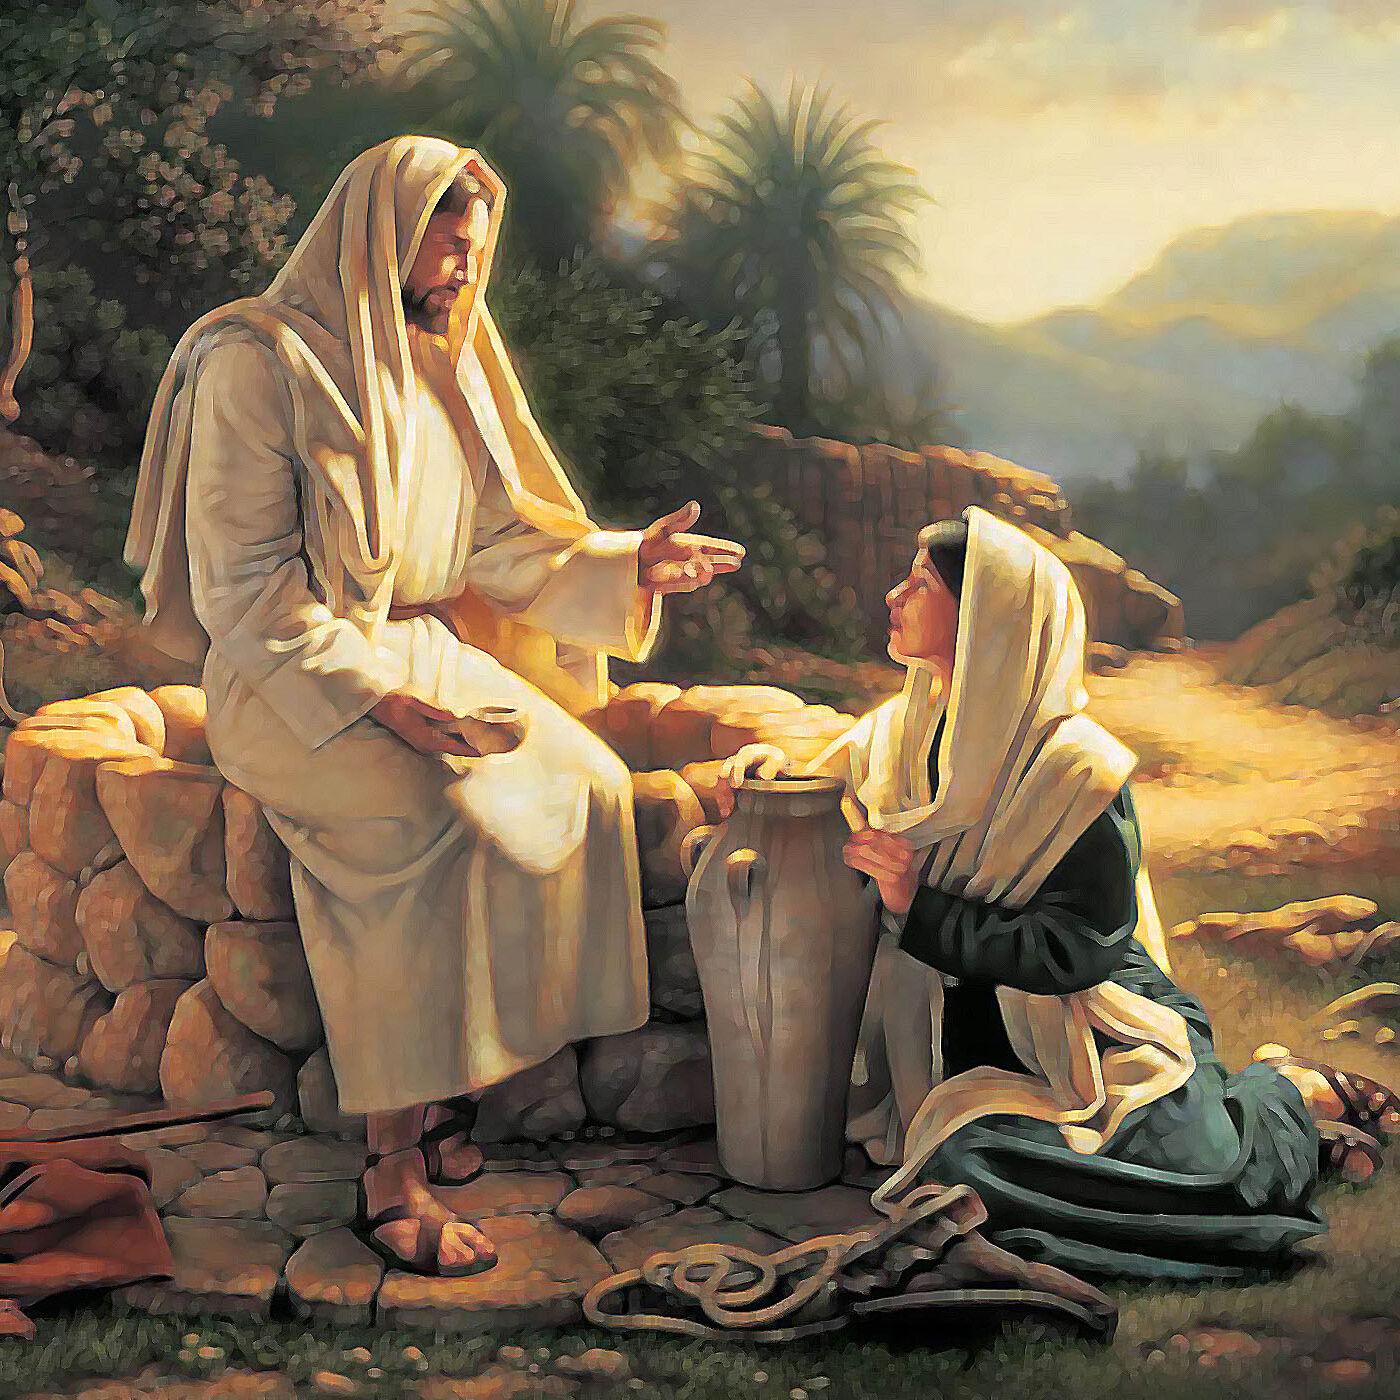 riflessioni sul Vangelo di Mercoledì 3 Marzo 2021 (Mt 20, 17-28)